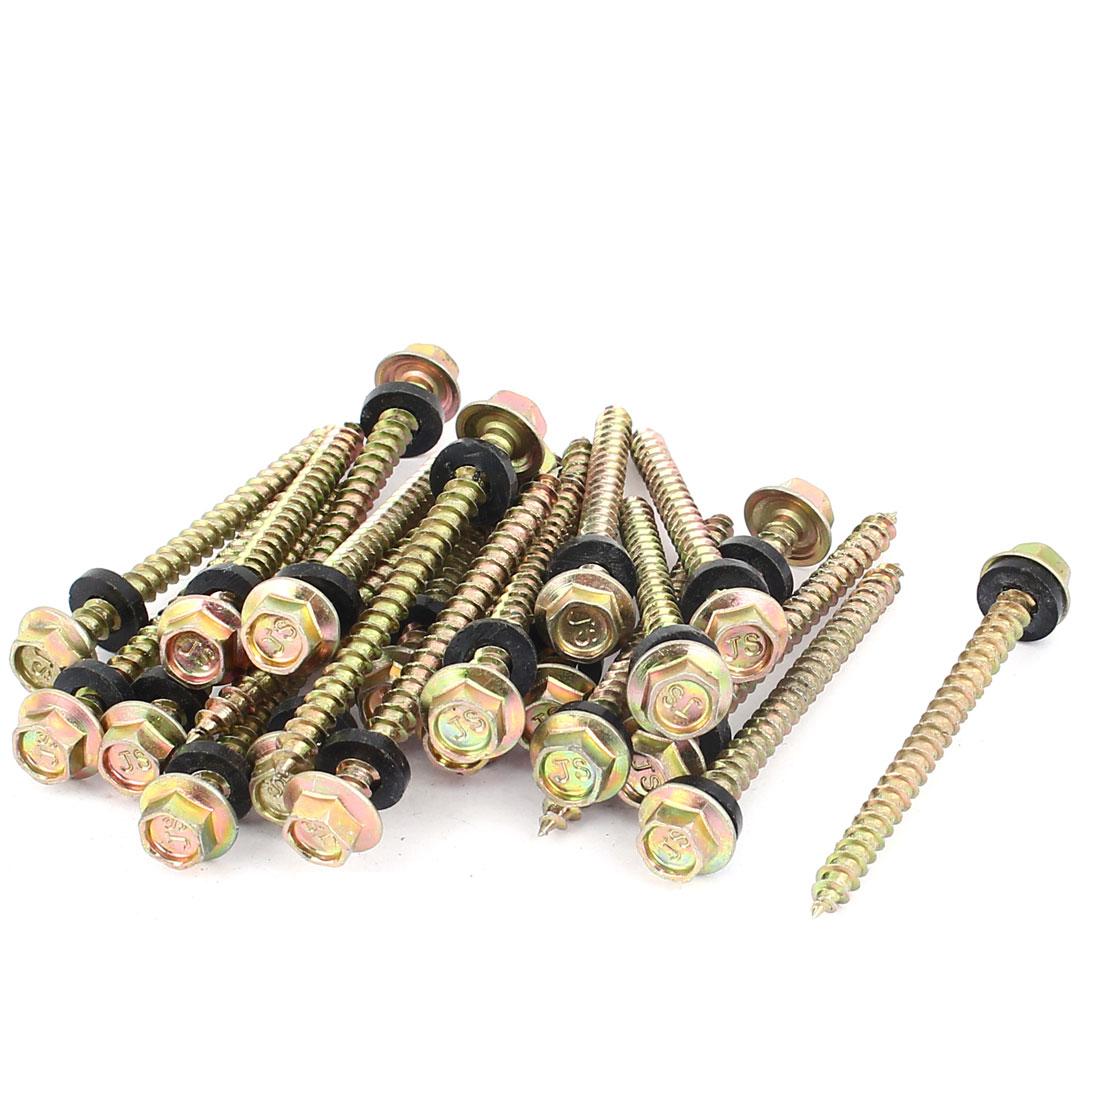 23pcs M5 x 60mm Male Thread Hex Head Self Tapping Drilling Screw Fastener w Washer